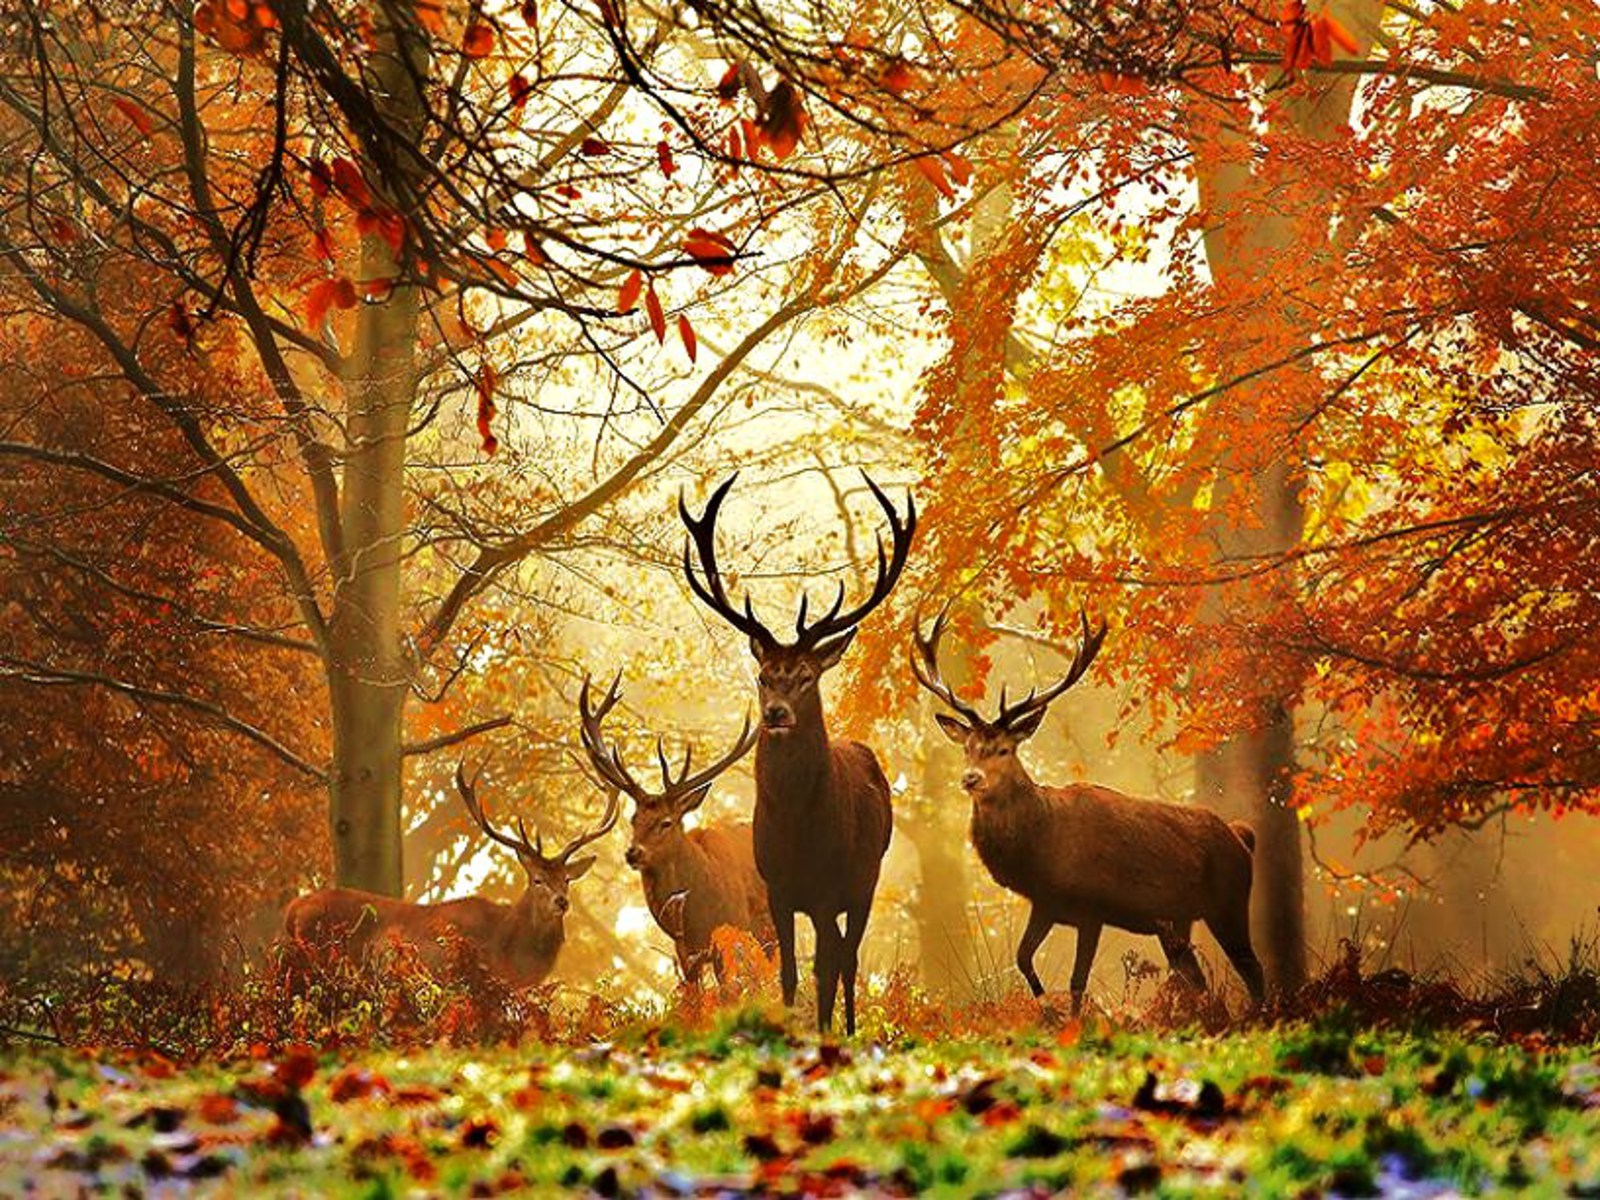 hd wallpapers deer hd wallpapers deer hd wallpapers deer hd wallpapers 1600x1200